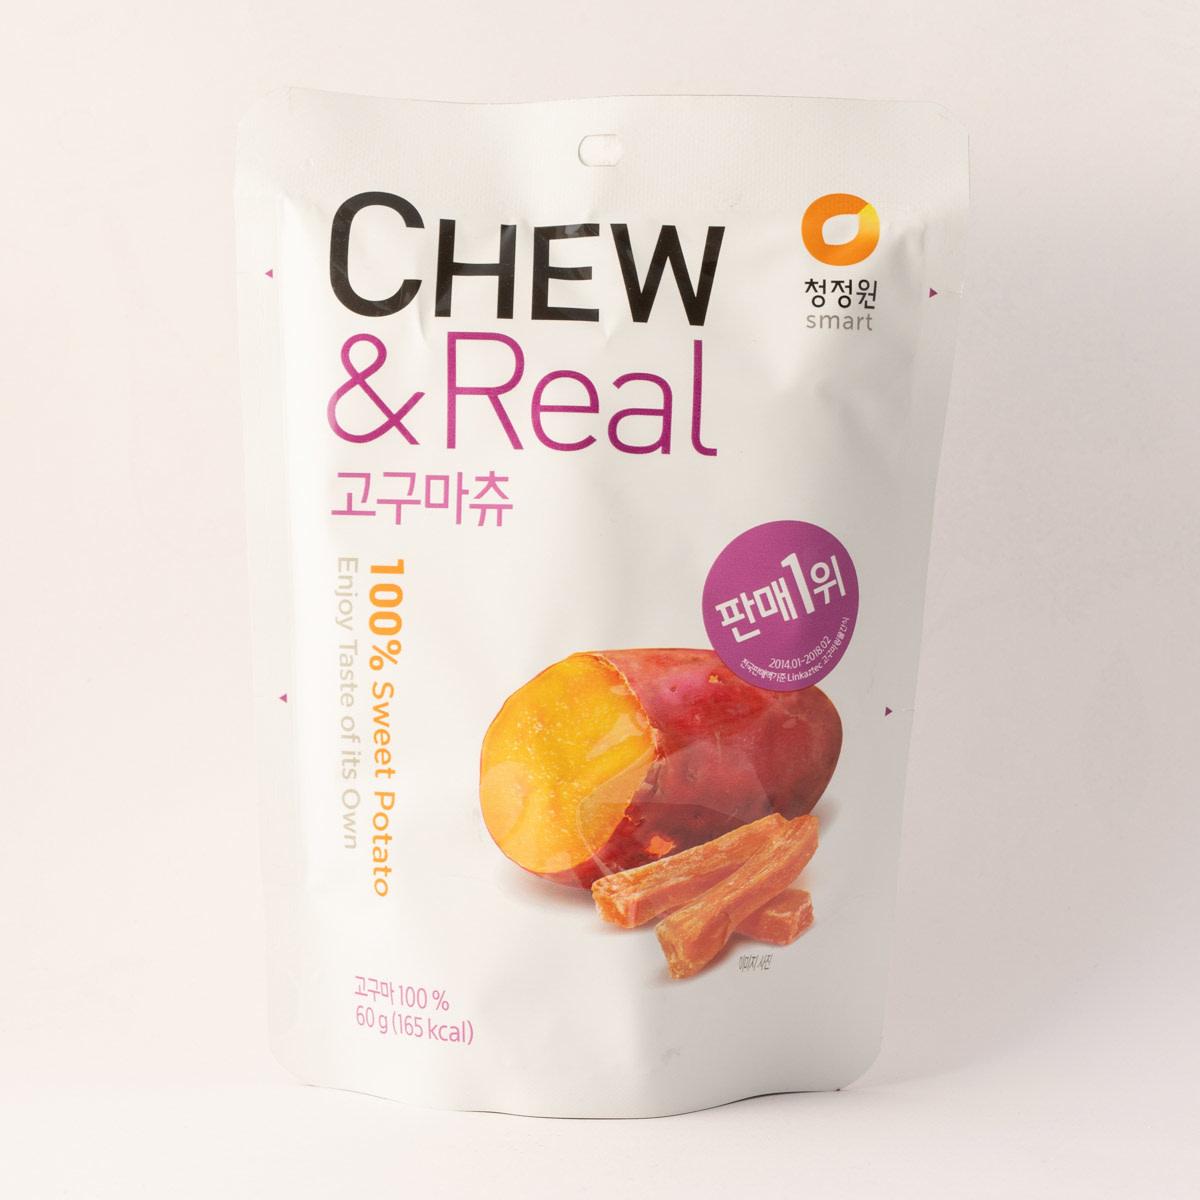 Chew & Real Sweet Potato